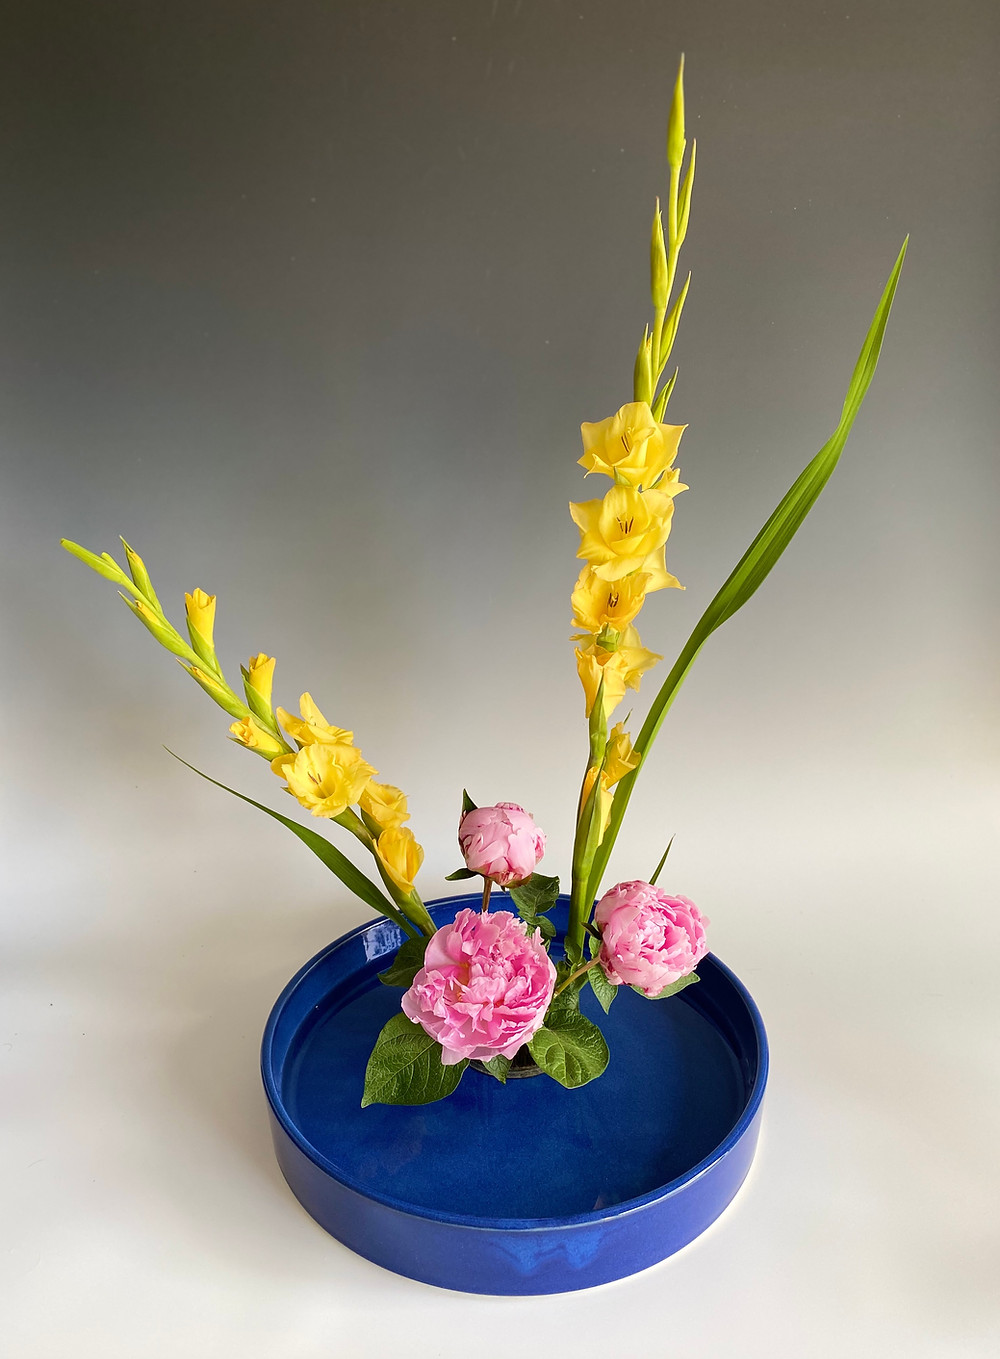 Basic moribana style ikebana with gladioli and peony.